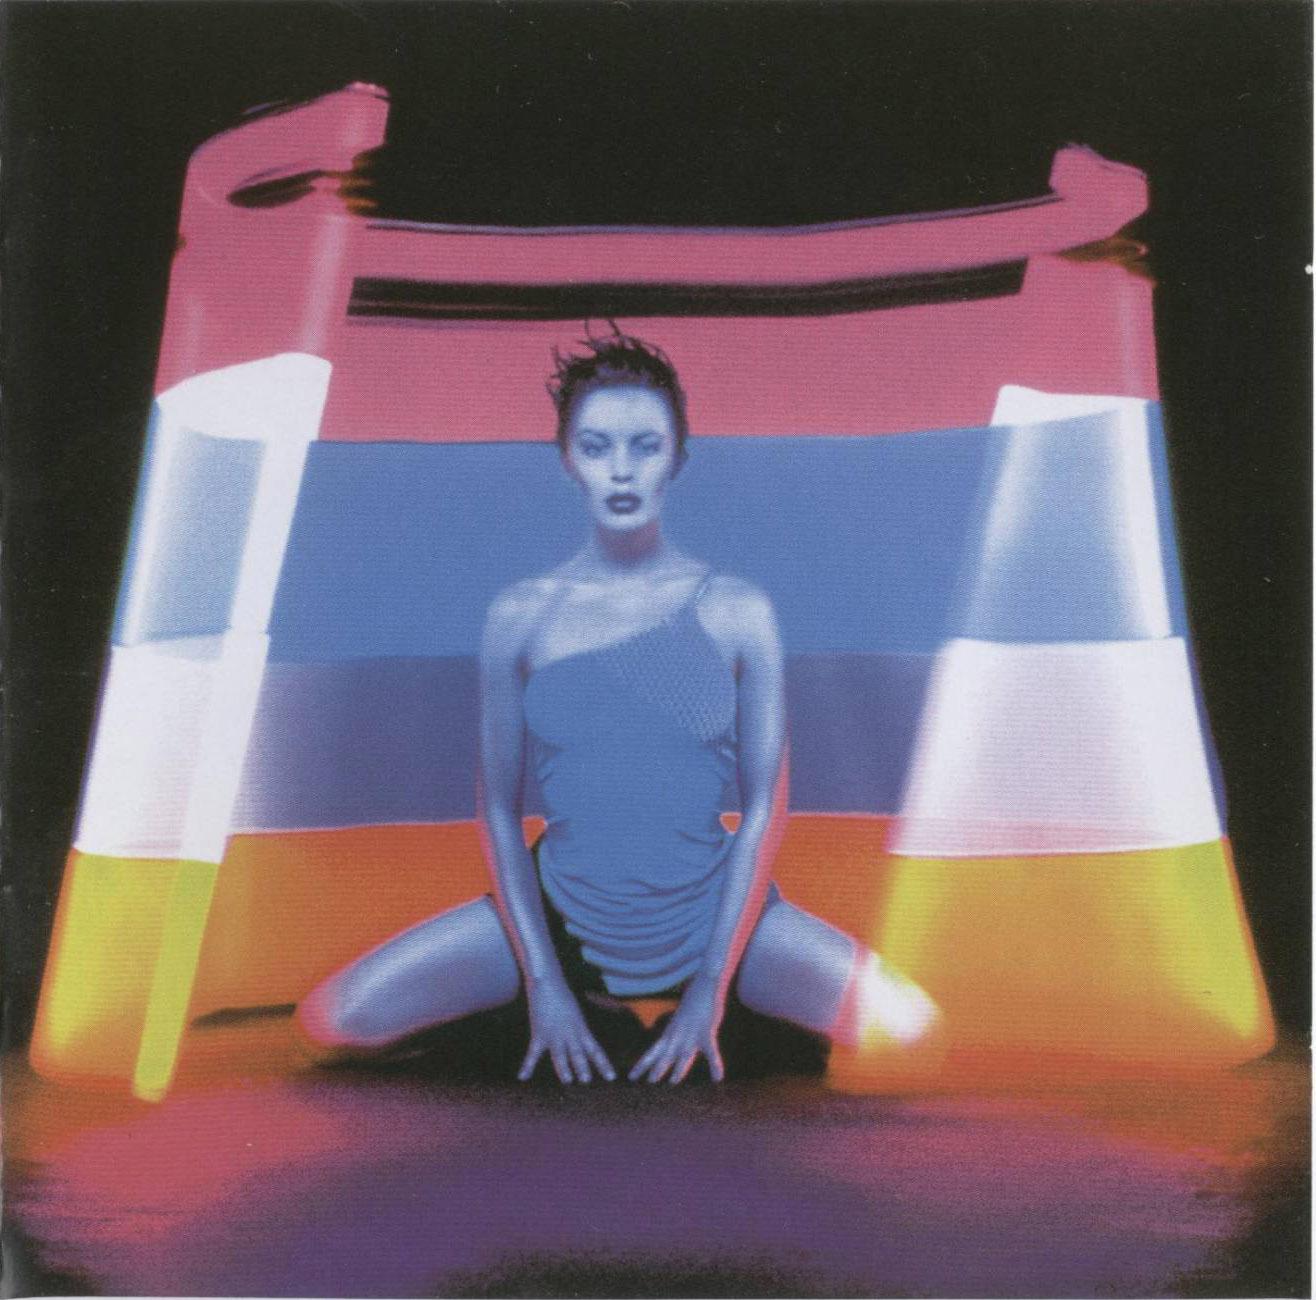 http://2.bp.blogspot.com/_YJM766qf5ps/TNayfYG0DwI/AAAAAAAAL8A/F8FGRG3BnL4/s1600/Kylie+Minogue+-+Impossible+Princess+%28SE%29+-+Front.jpg